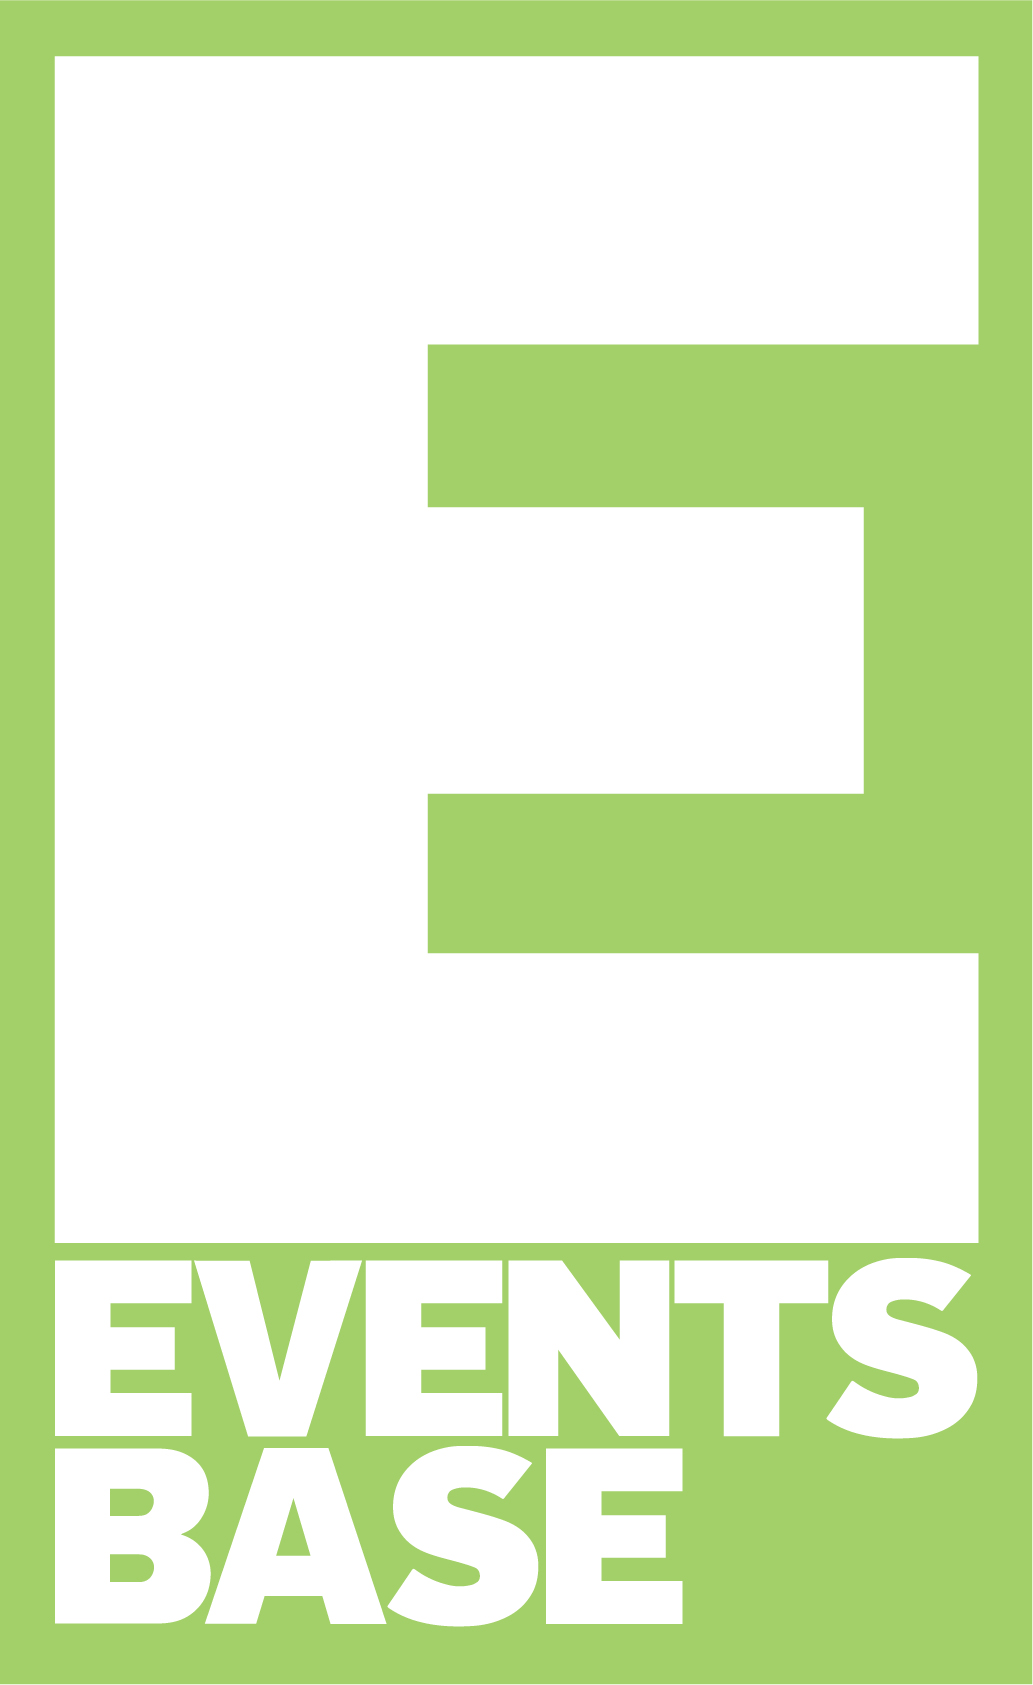 Eventsbase